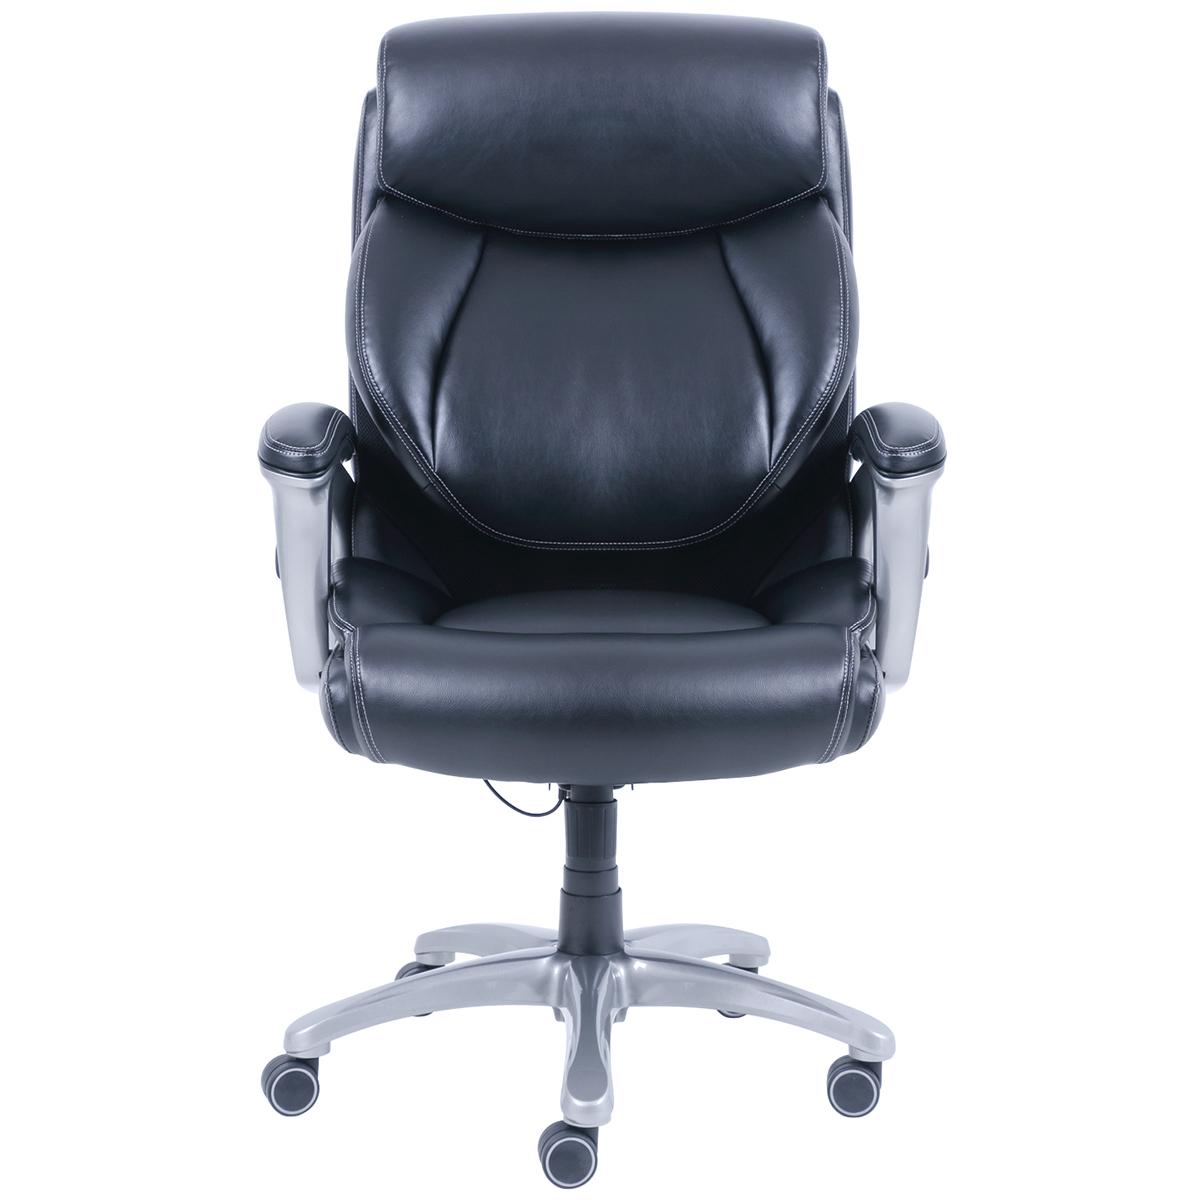 True Wellness Magic Back Office Chair Costco Australia